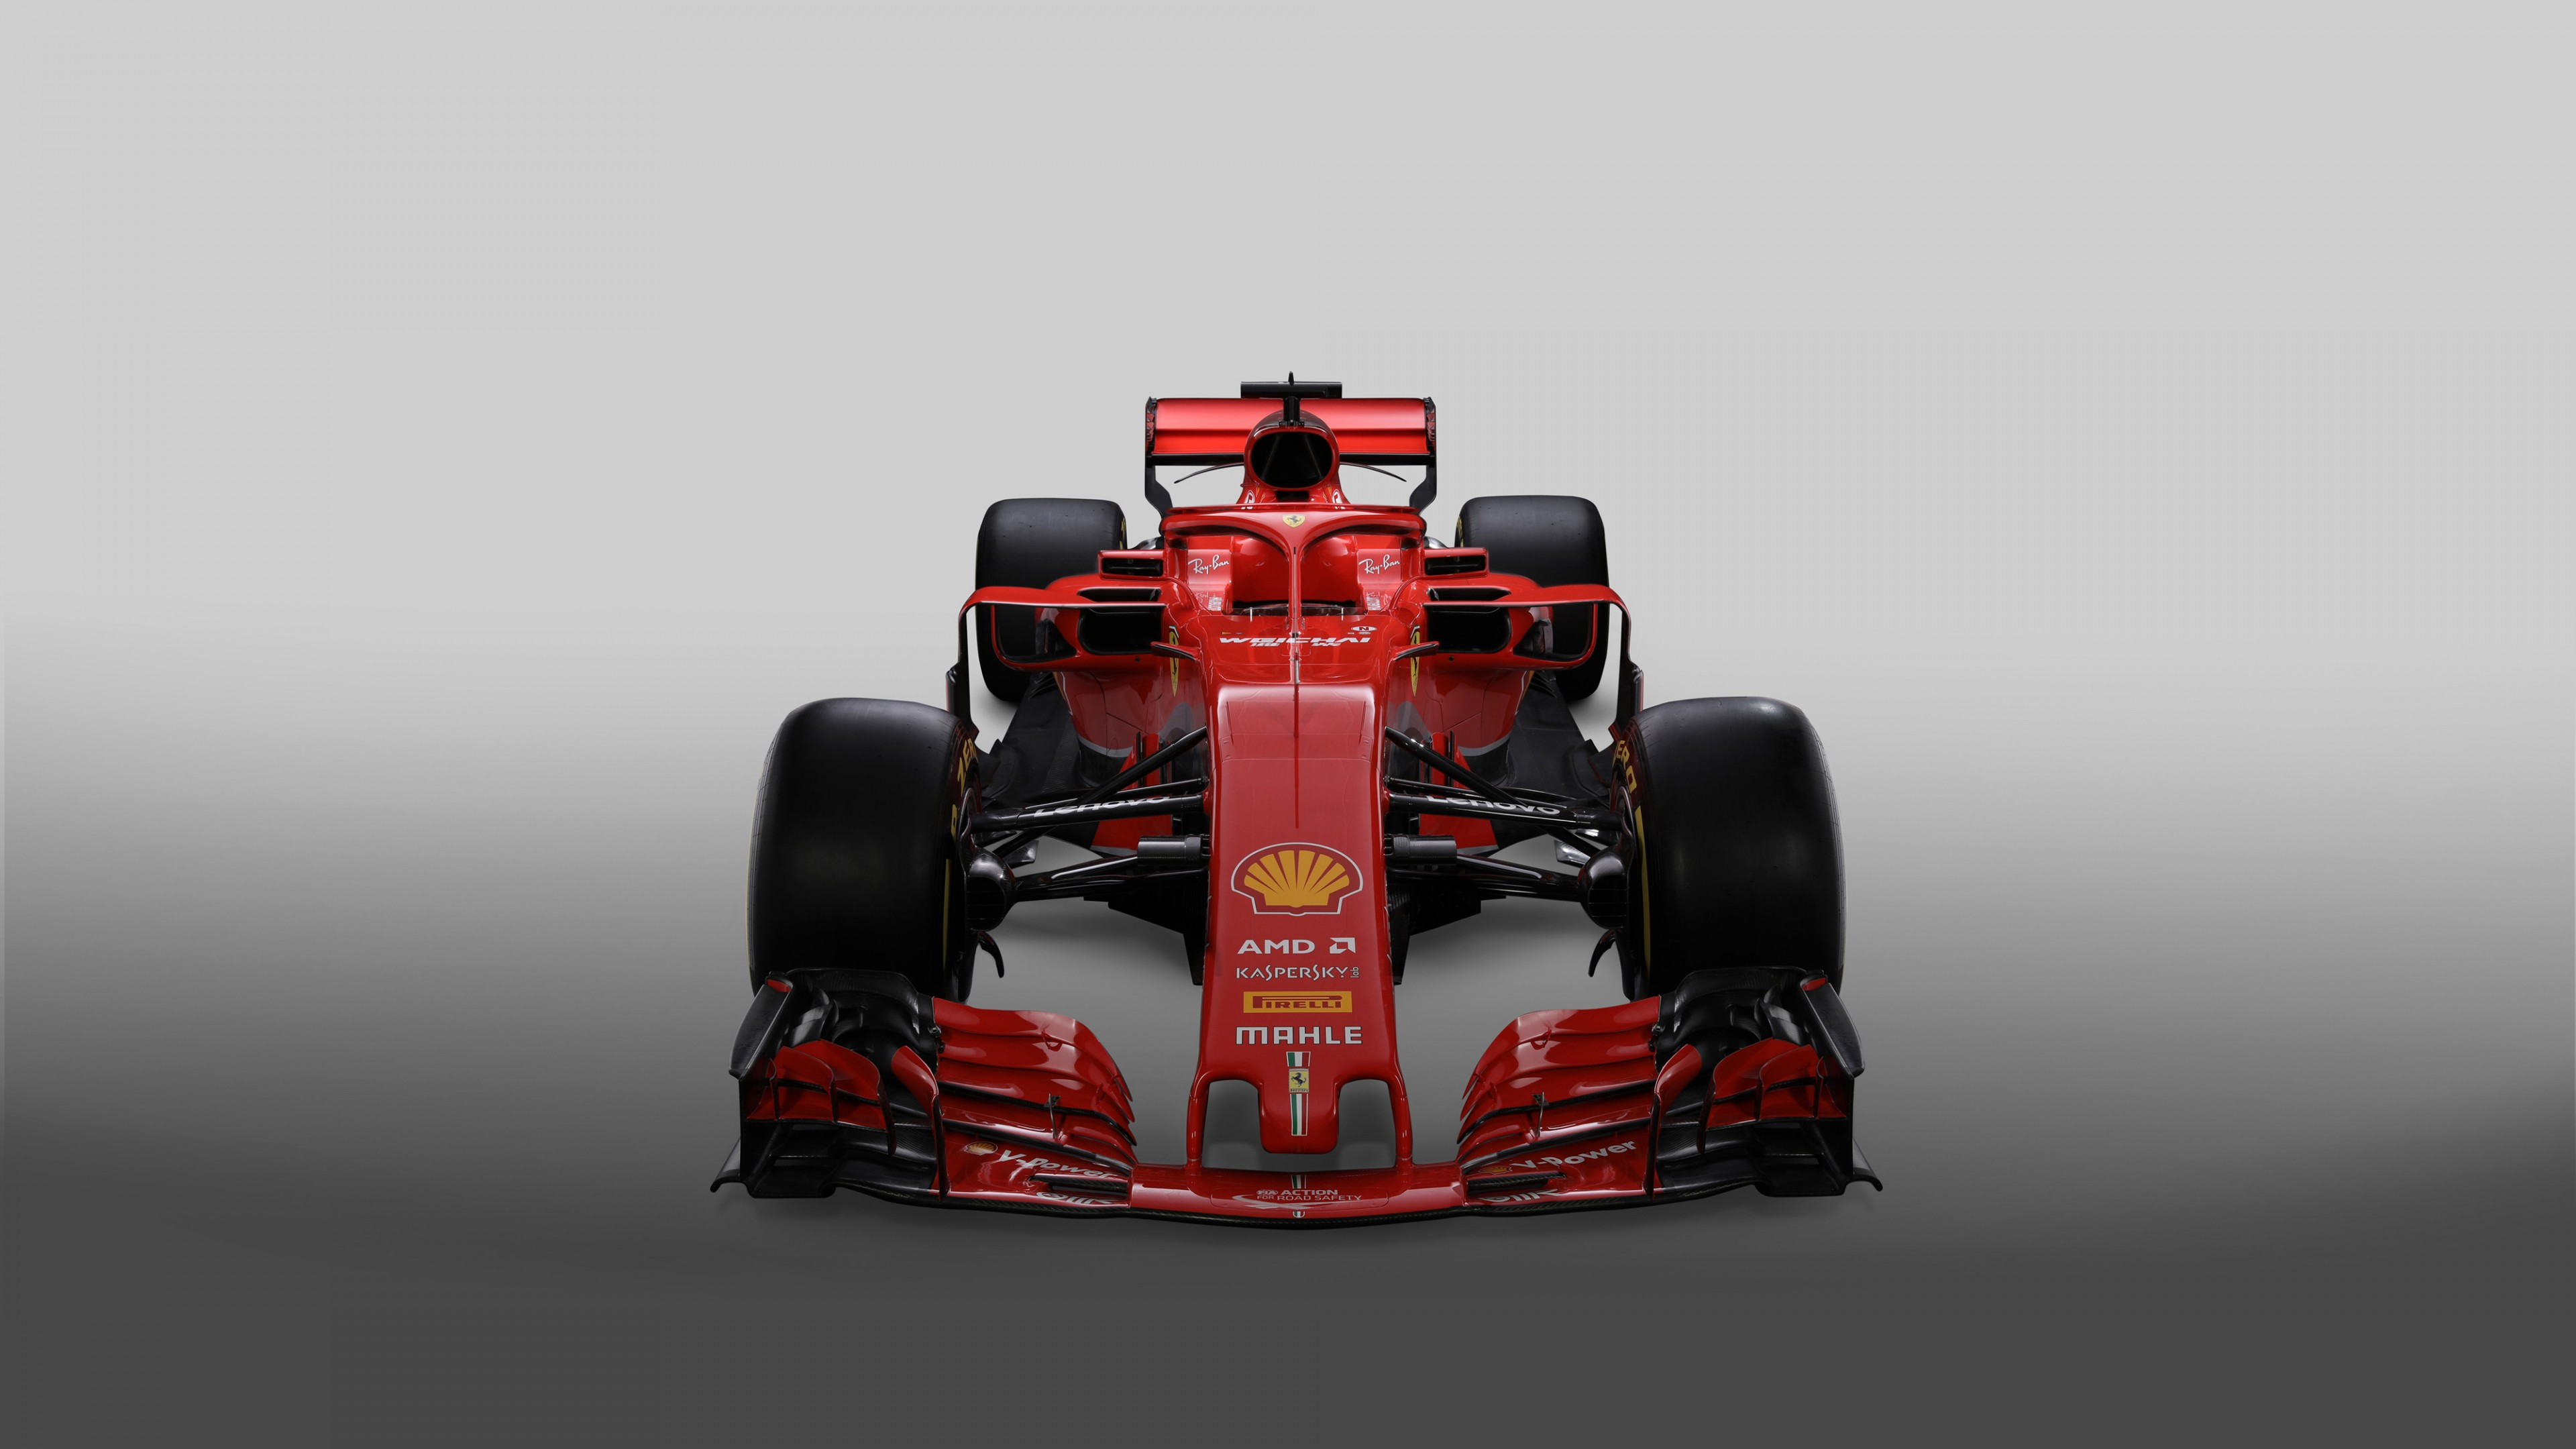 2018 Ferrari Sf71h F1 Formula 1 4k Wallpaper Hd Car Wallpapers Id 9655